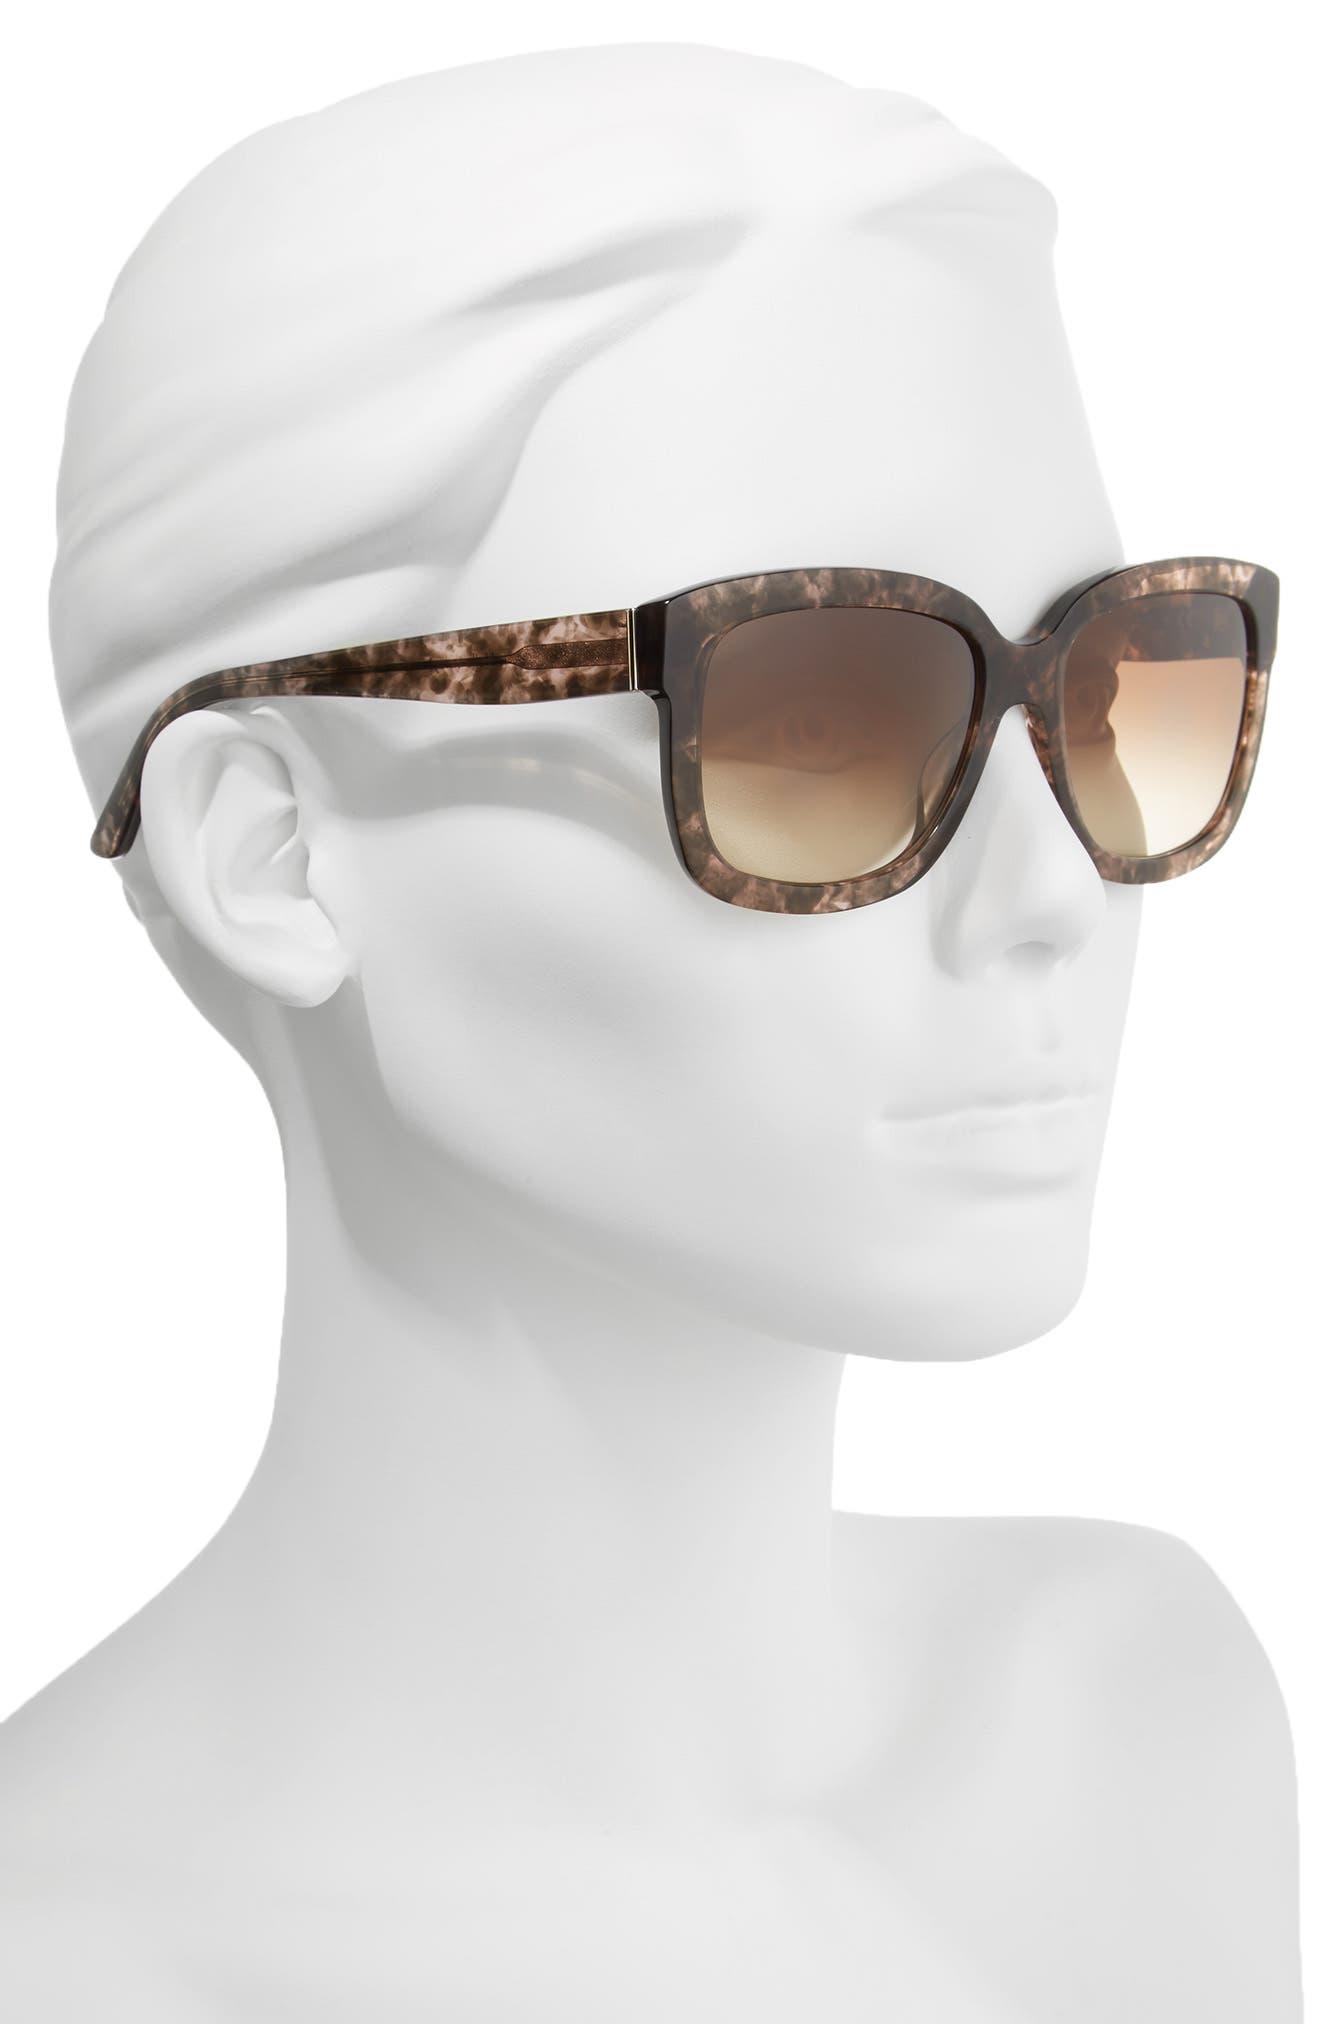 Black Label 55mm Square Sunglasses,                             Alternate thumbnail 2, color,                             210